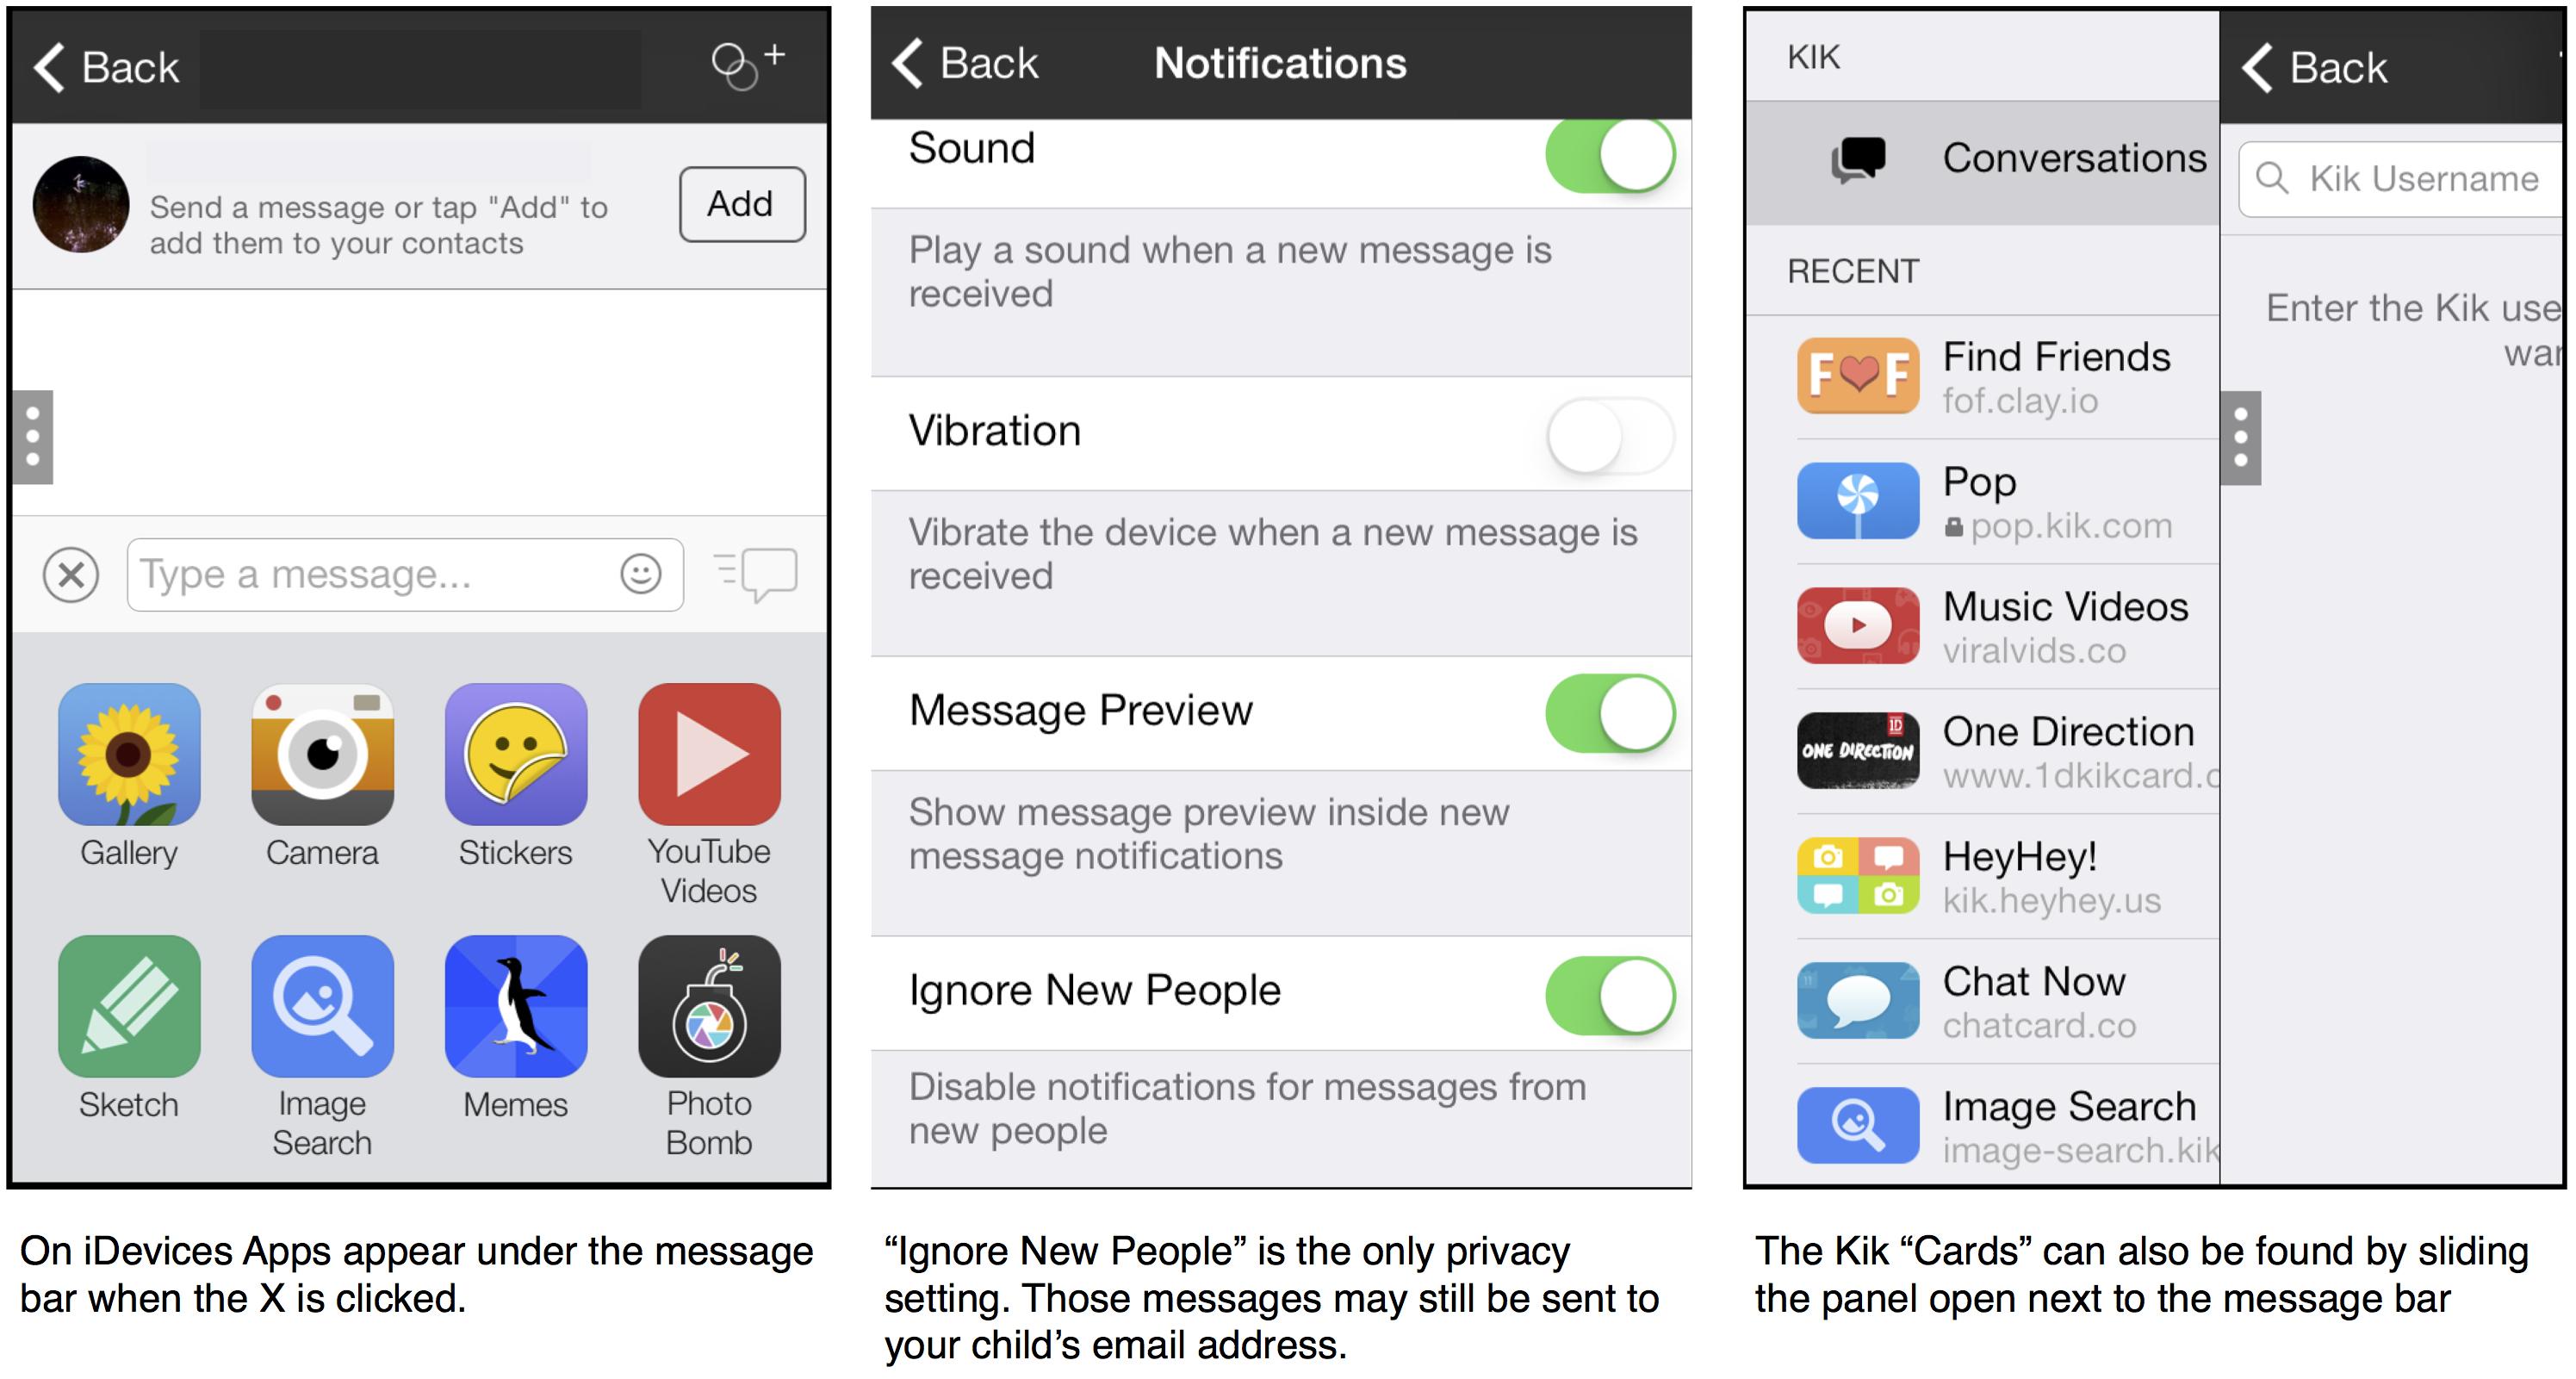 th?id=OIP.WwMUmx8CJtfzDL7Z0yXsvAEEEs&pid=15 Kik Messenger: Two steps to send video's on Kik Messenger App